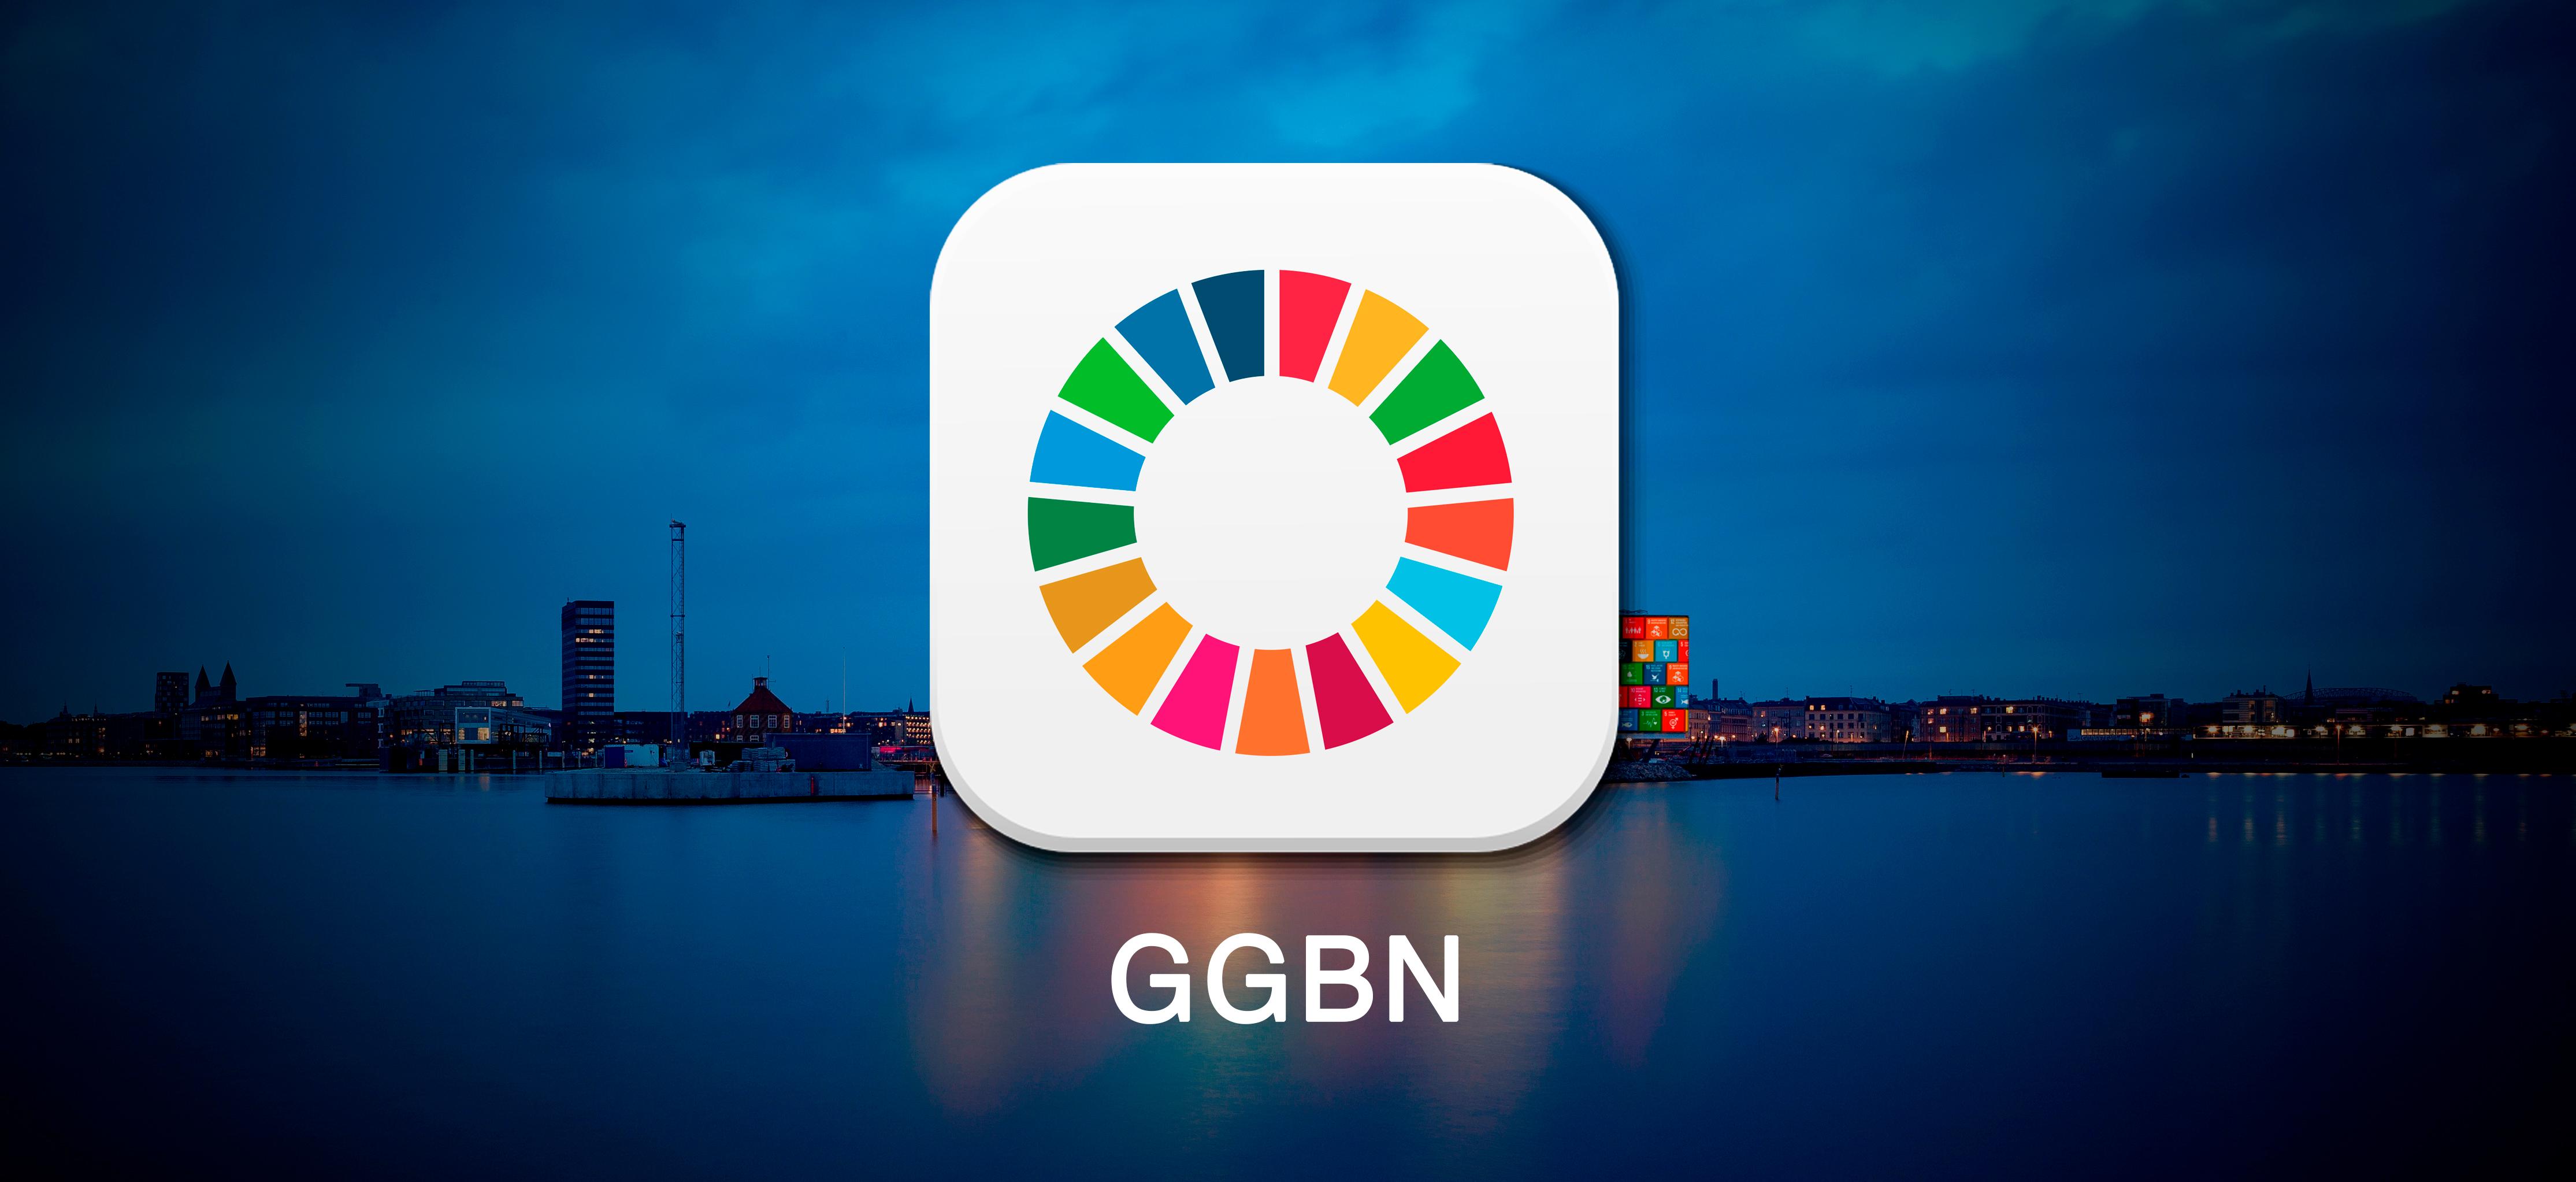 Ny app inspirerer til dit arbejde med Verdensmålene